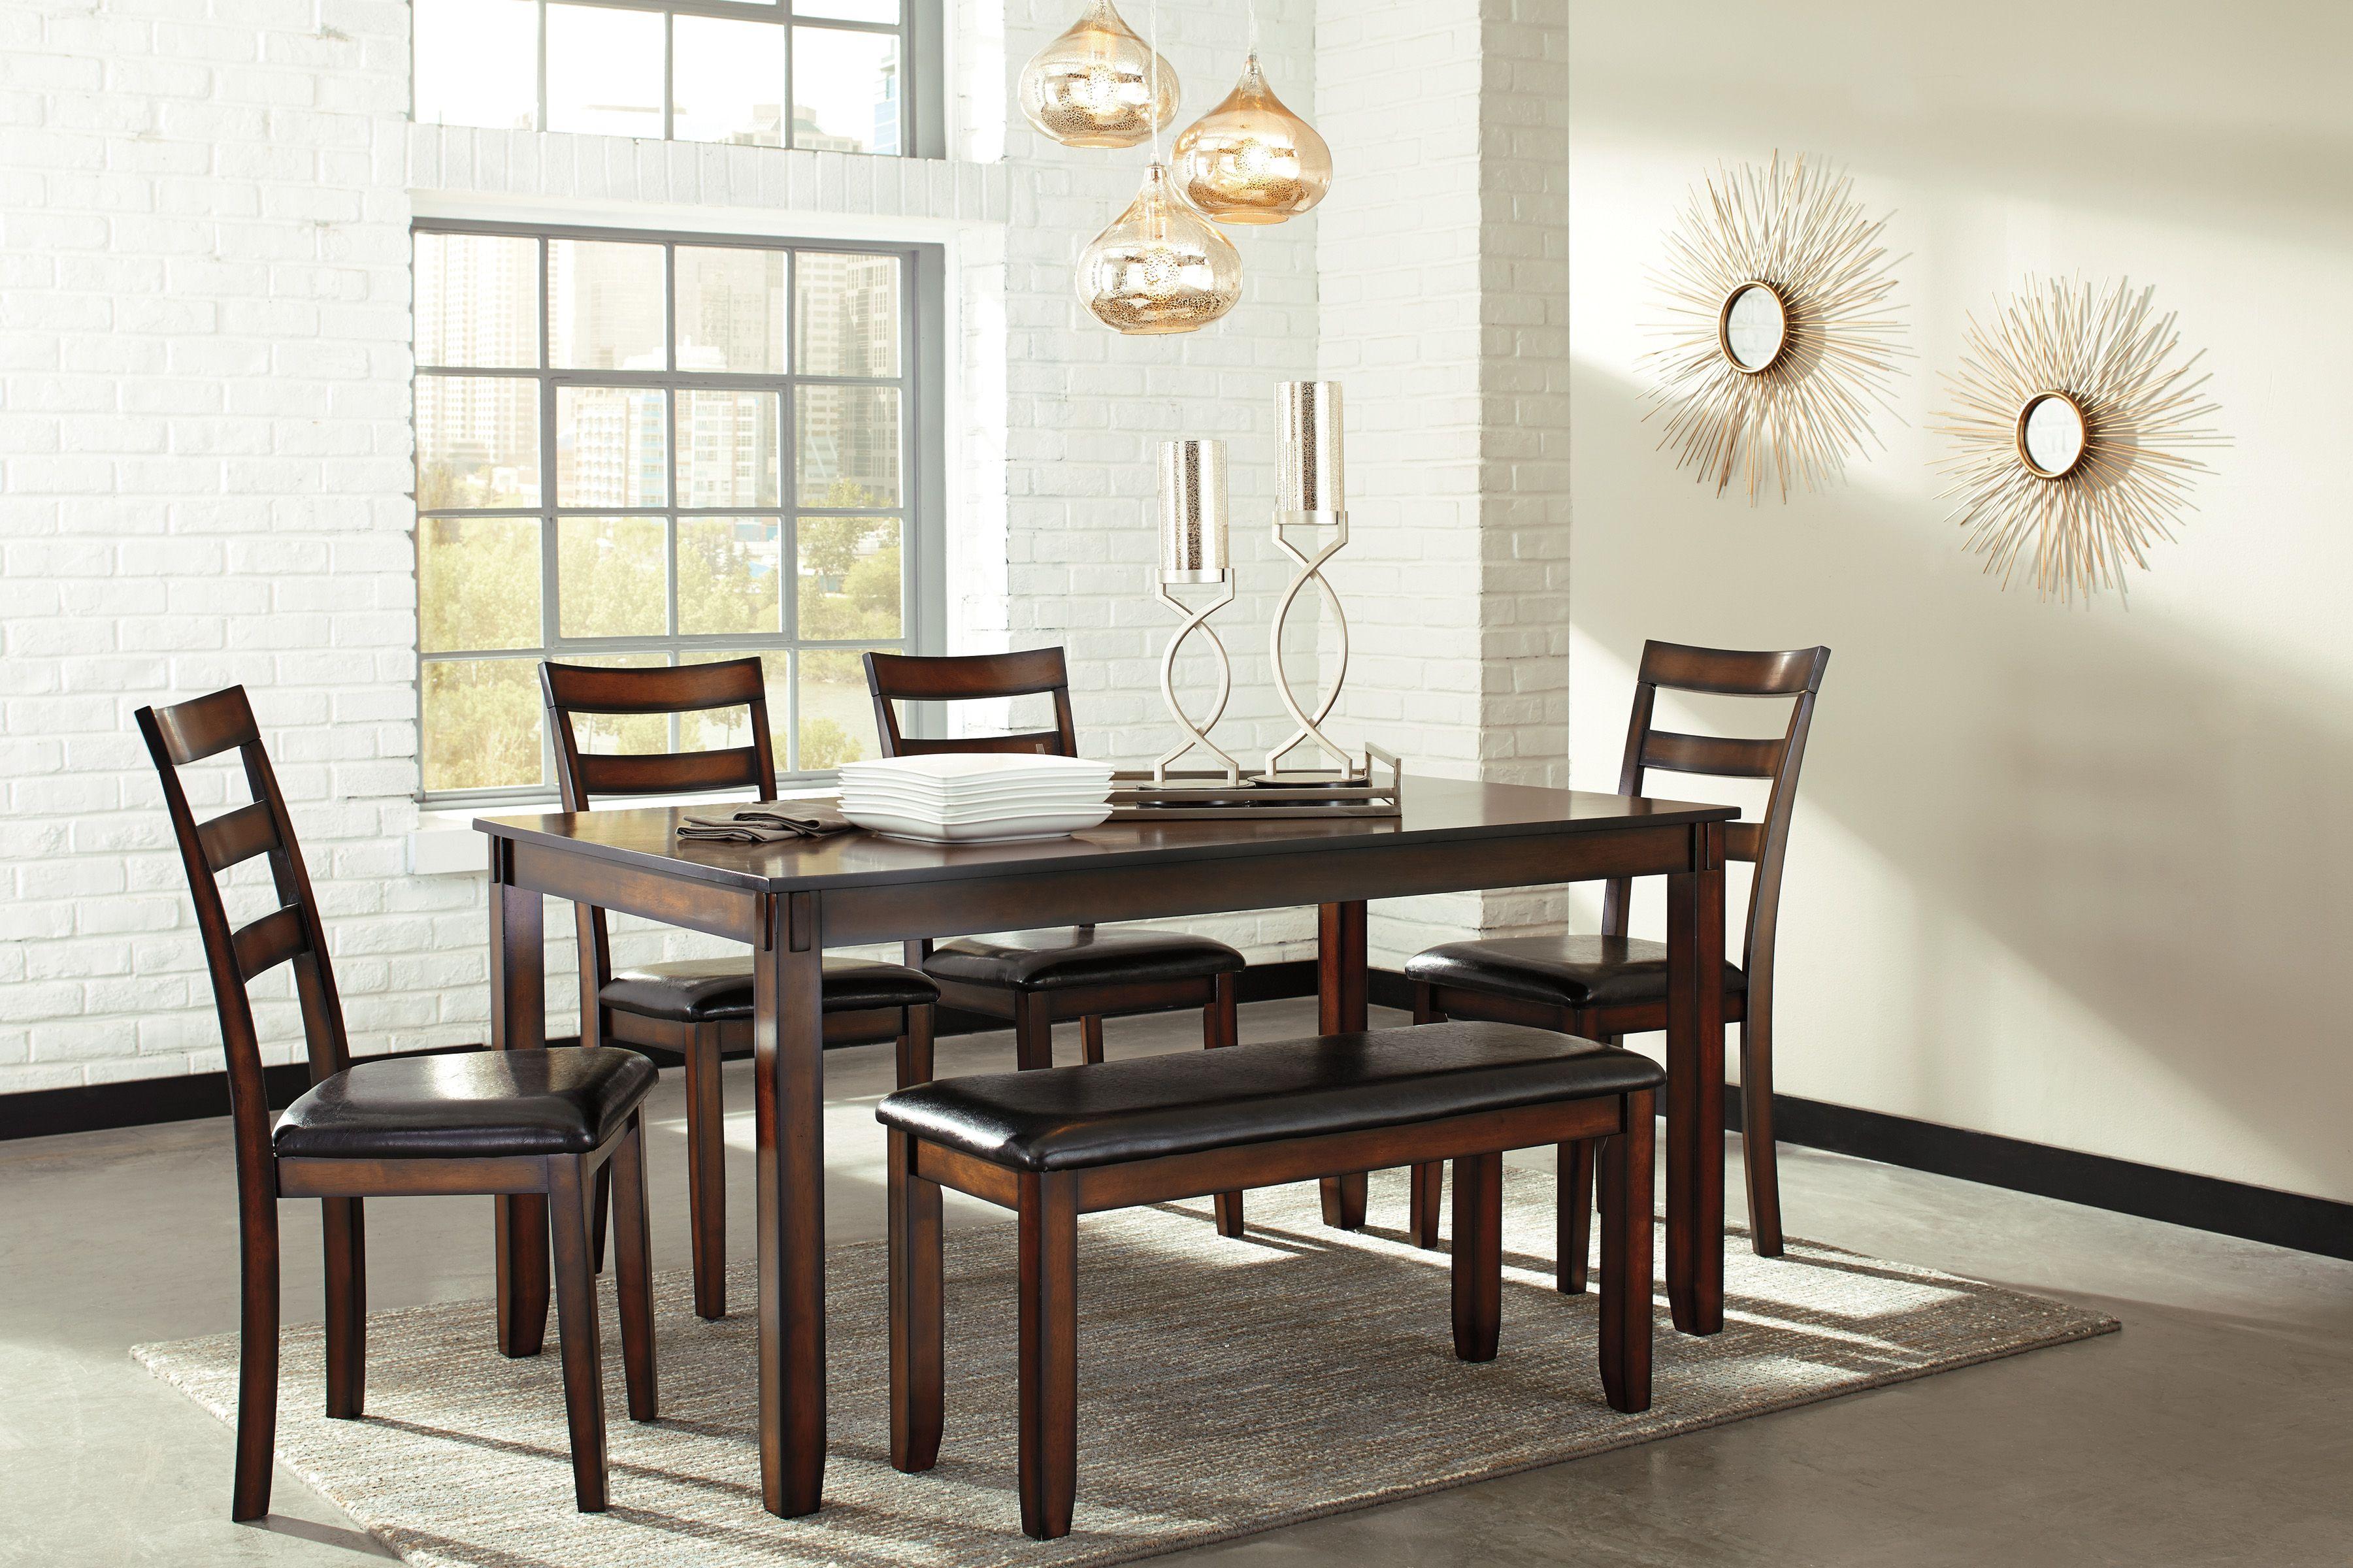 45++ Jr furniture dining sets Best Choice